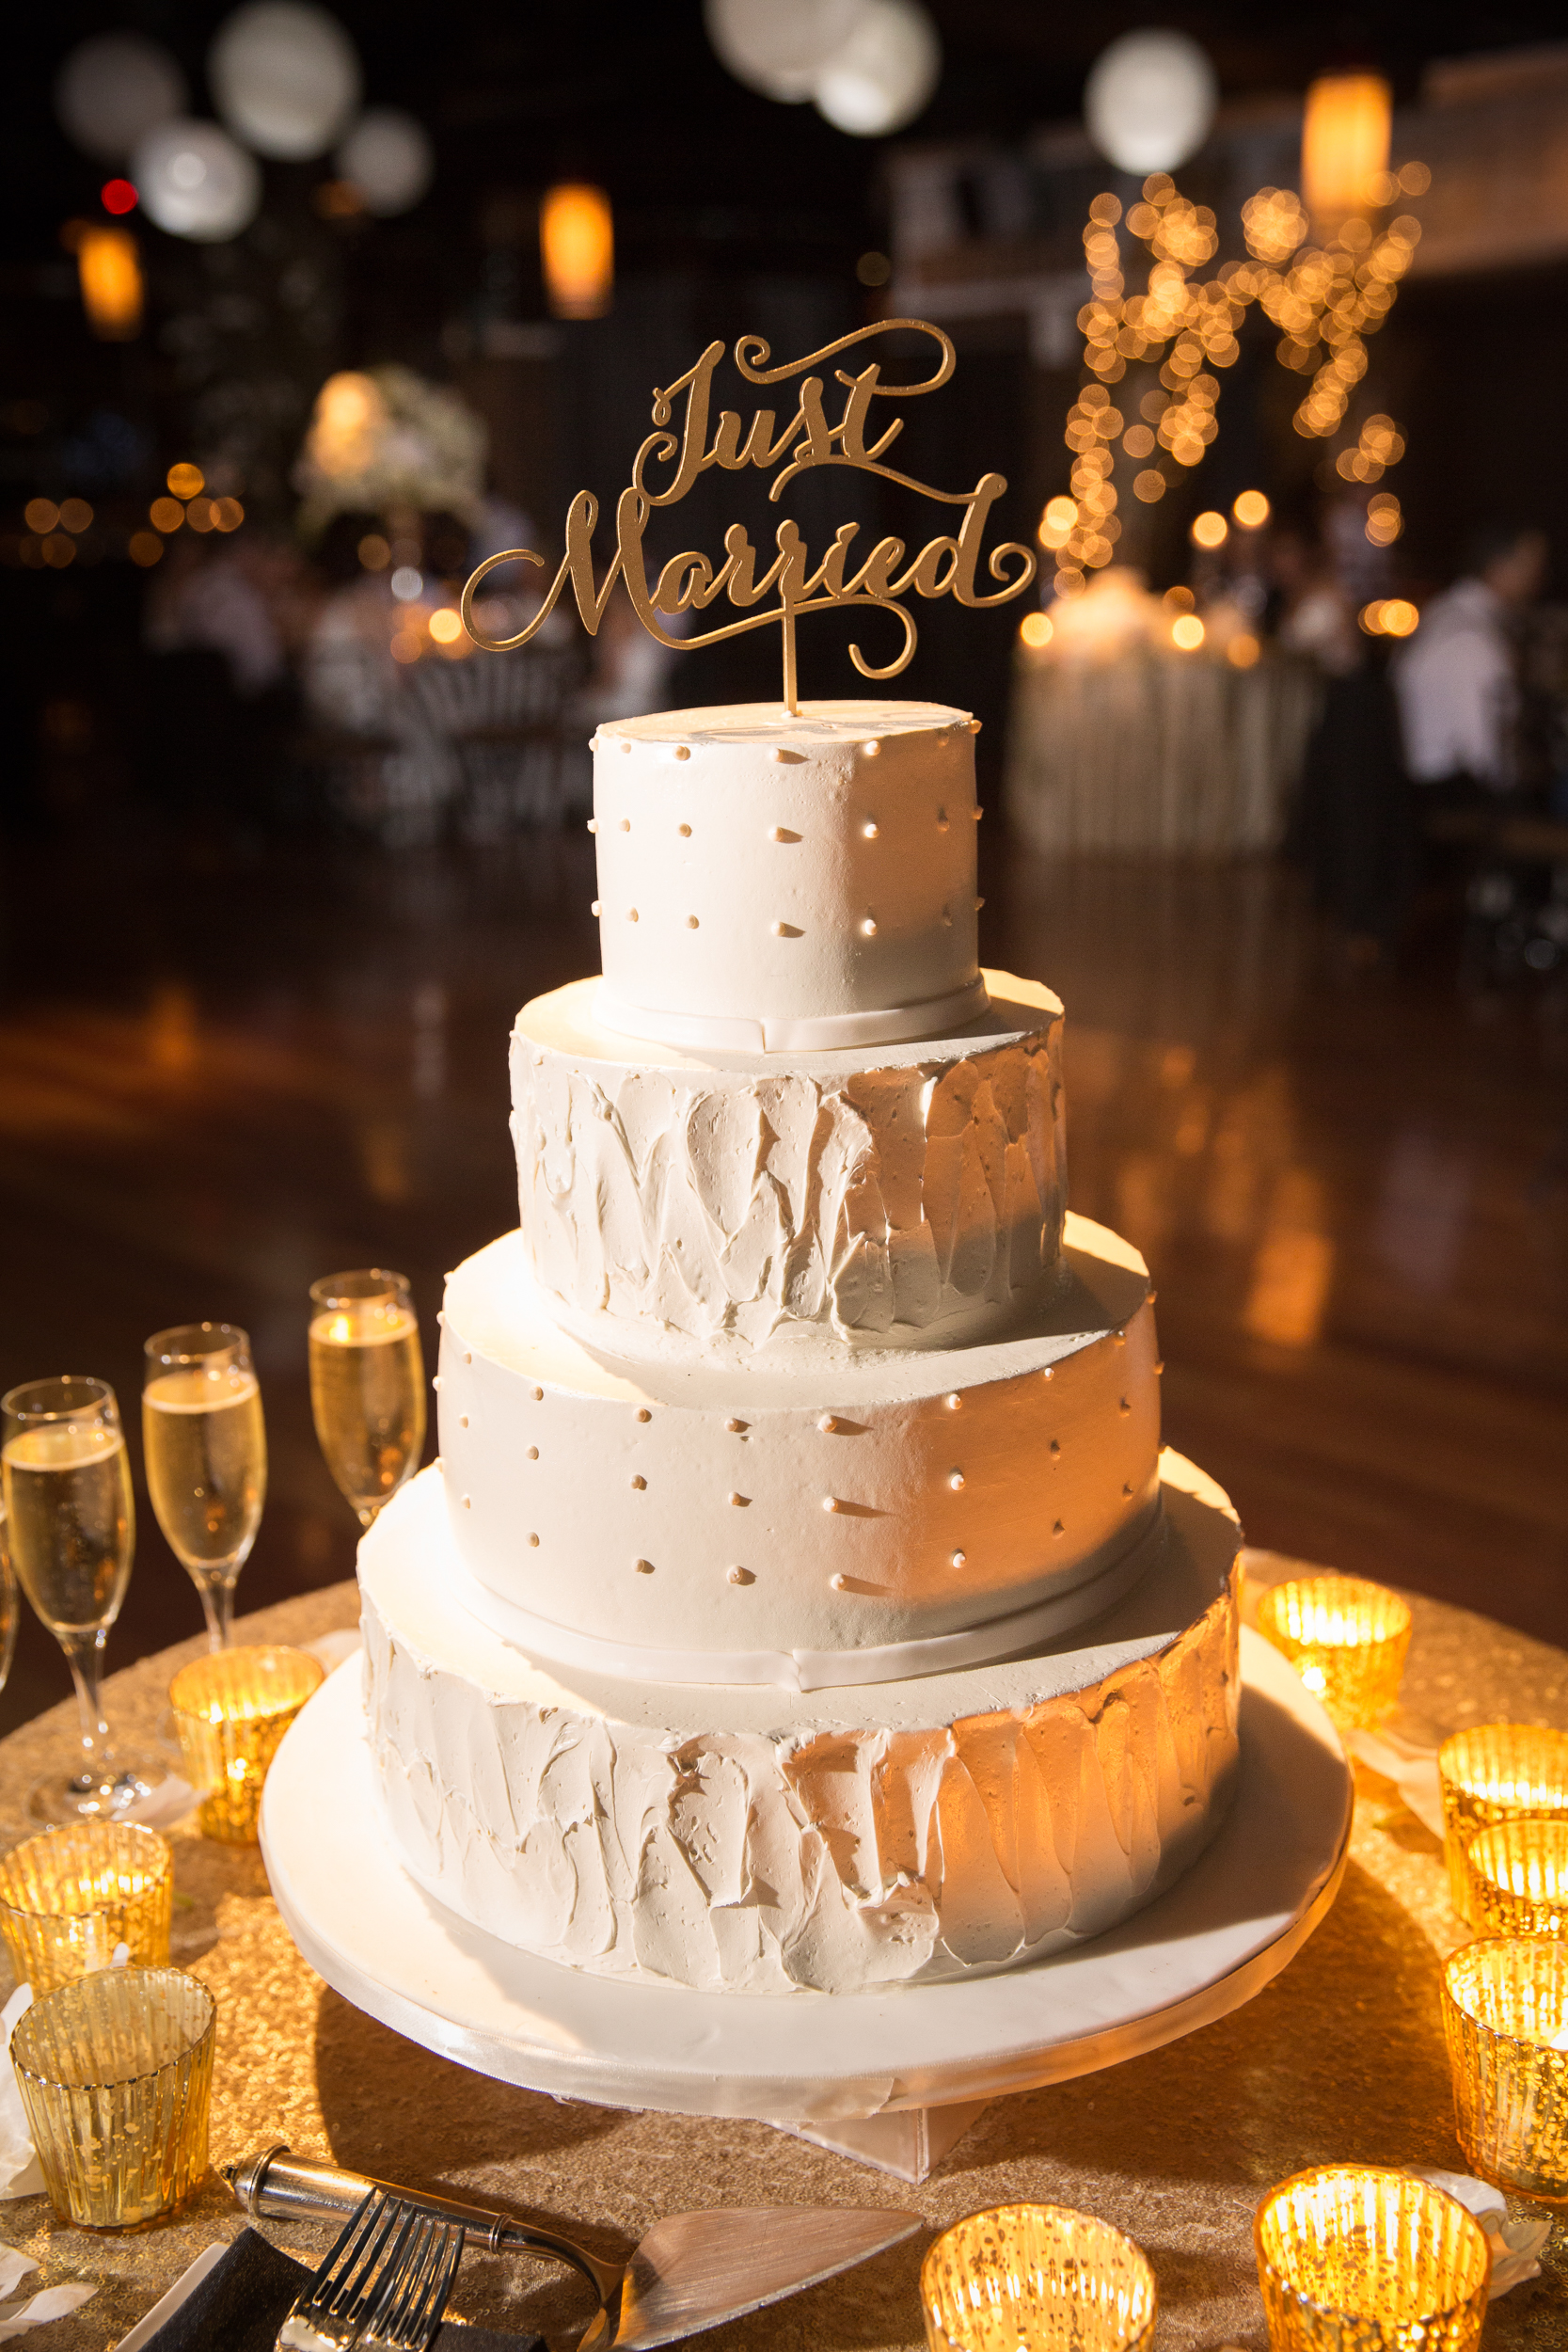 Ceci_New_York_Style_Luxury_Custom_Summer_Wedding_CeciBride_Letterpress_NewYork_Foil_Lighthouse_Chelsea_Piers_81.jpg